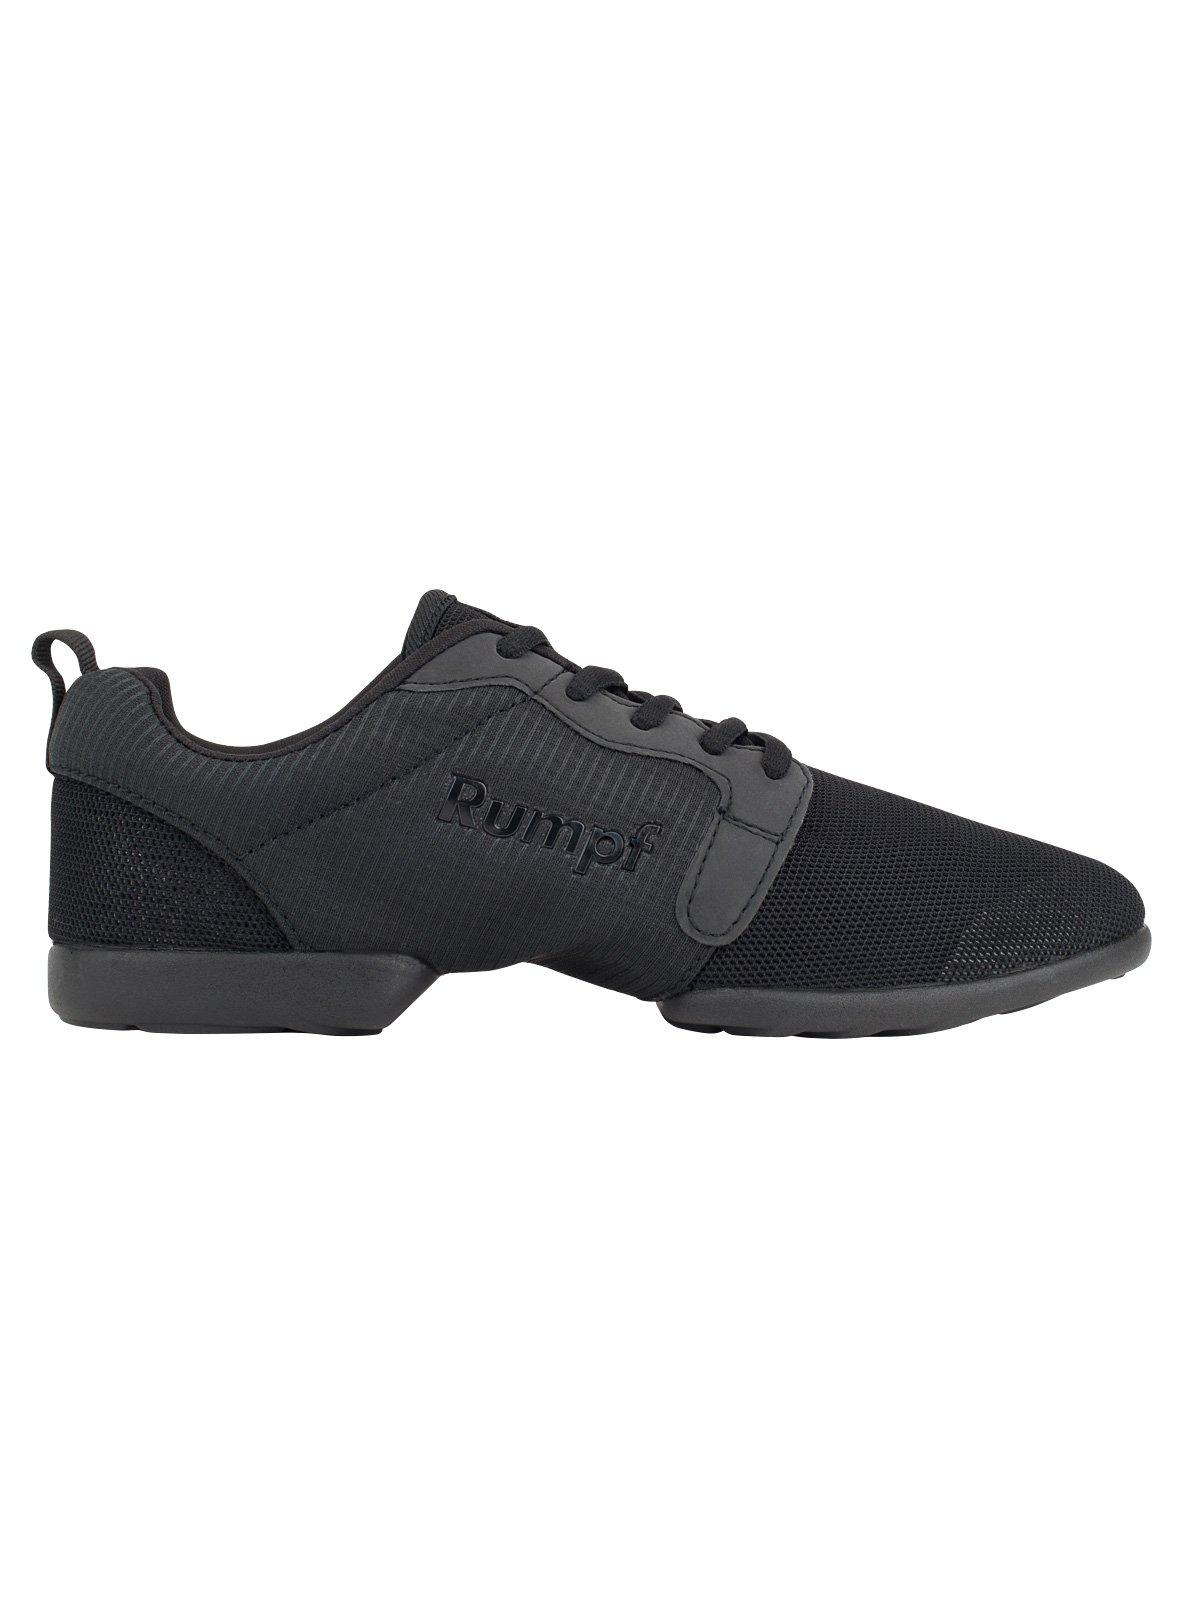 Rumpf Mojo 1510 Dancesneaker Black Size US 12½ Women | US 11½ Men